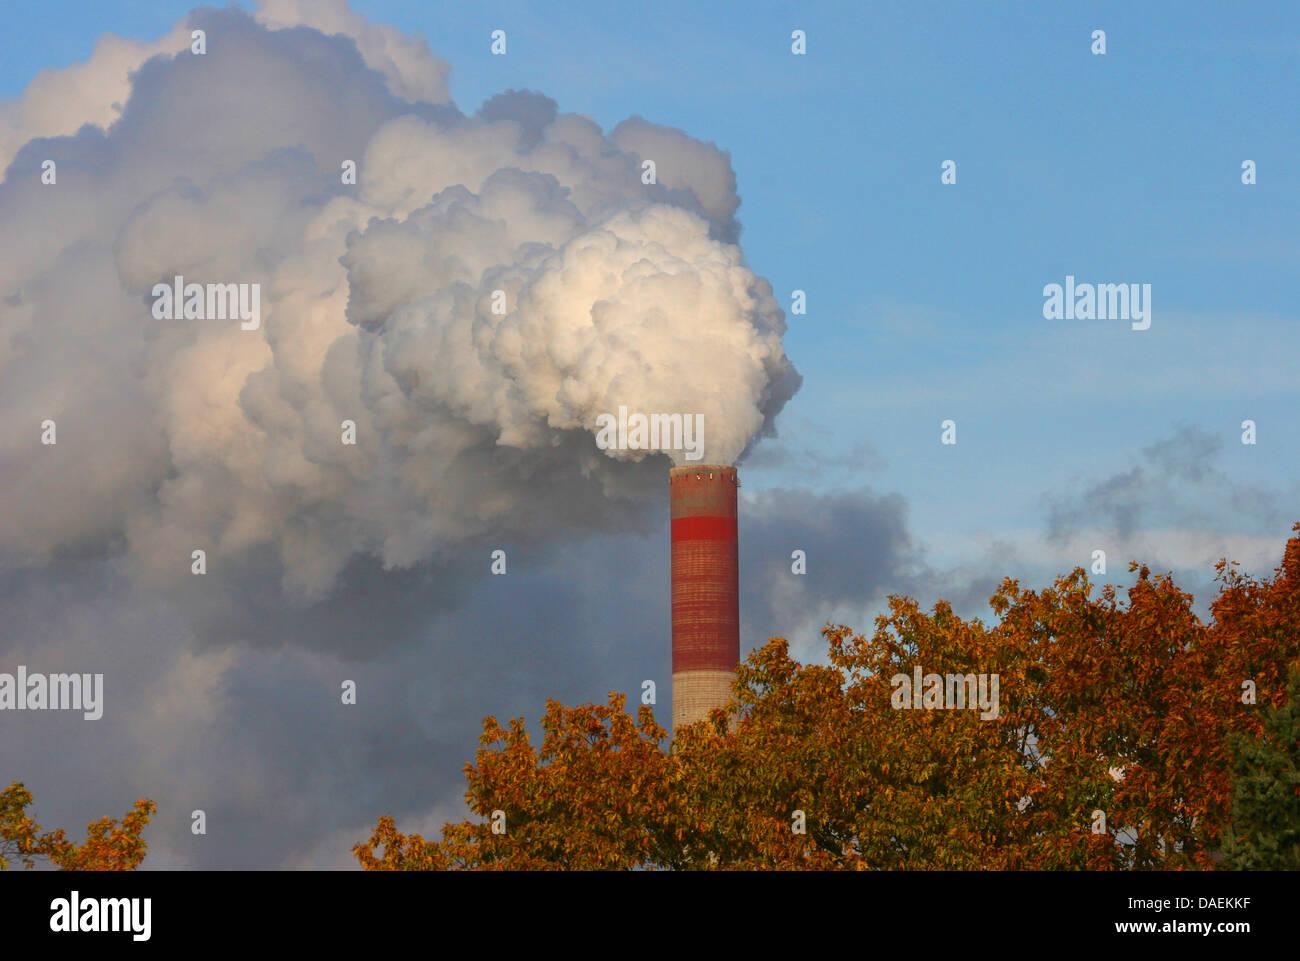 heavily smoking factory chimney, Germany, North Rhine-Westphalia, Ruhr Area Stock Photo